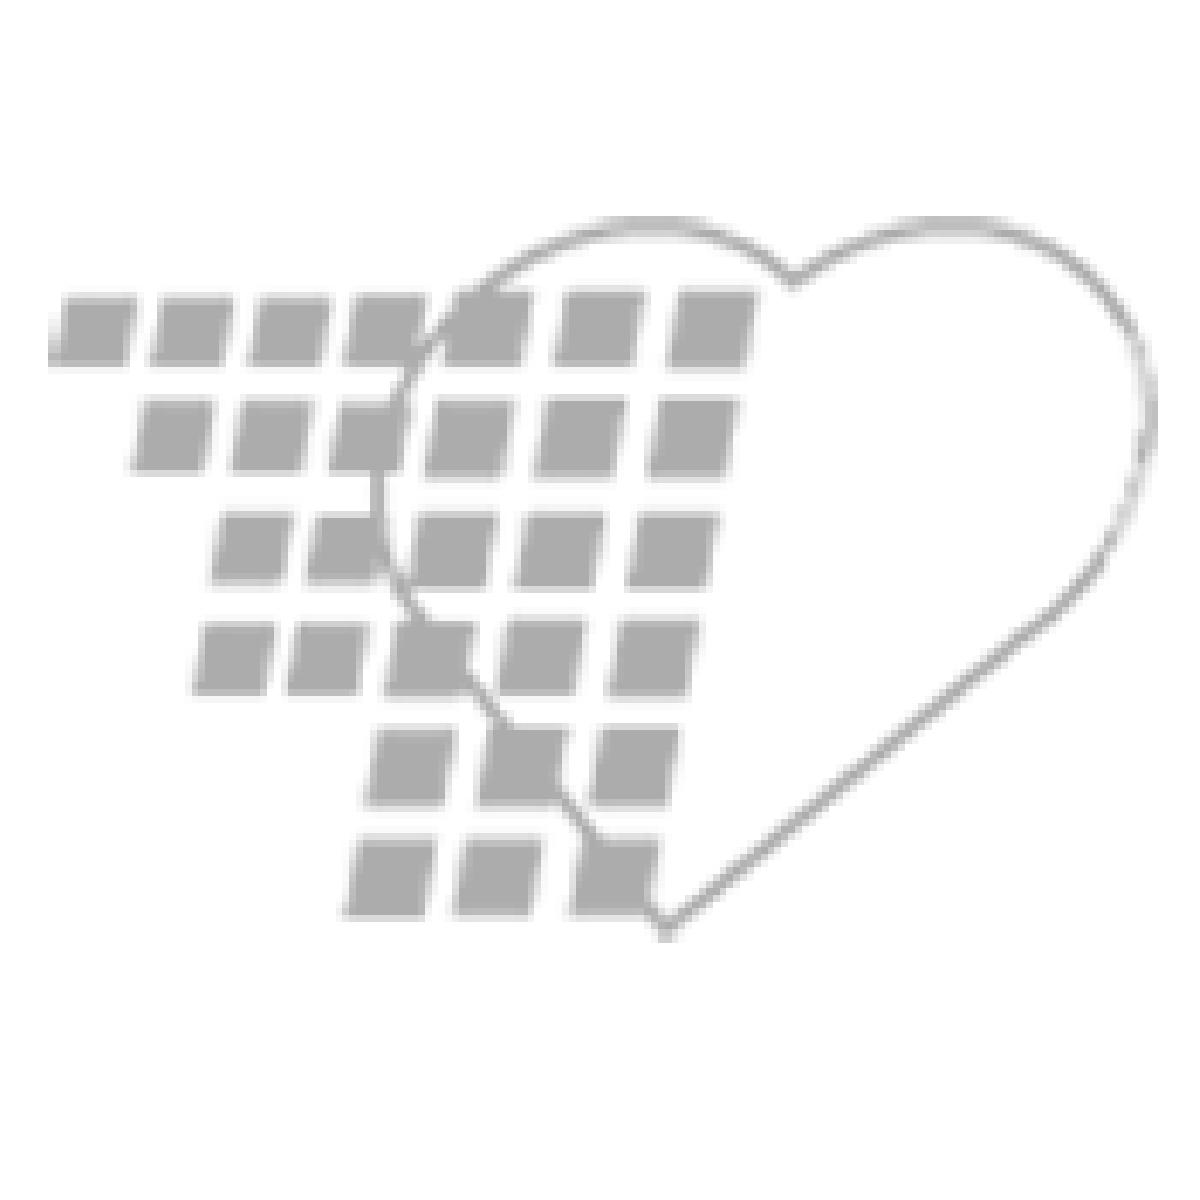 06-93-6936 Demo Dose® Procainamid Procn 100 mg mL/10mL